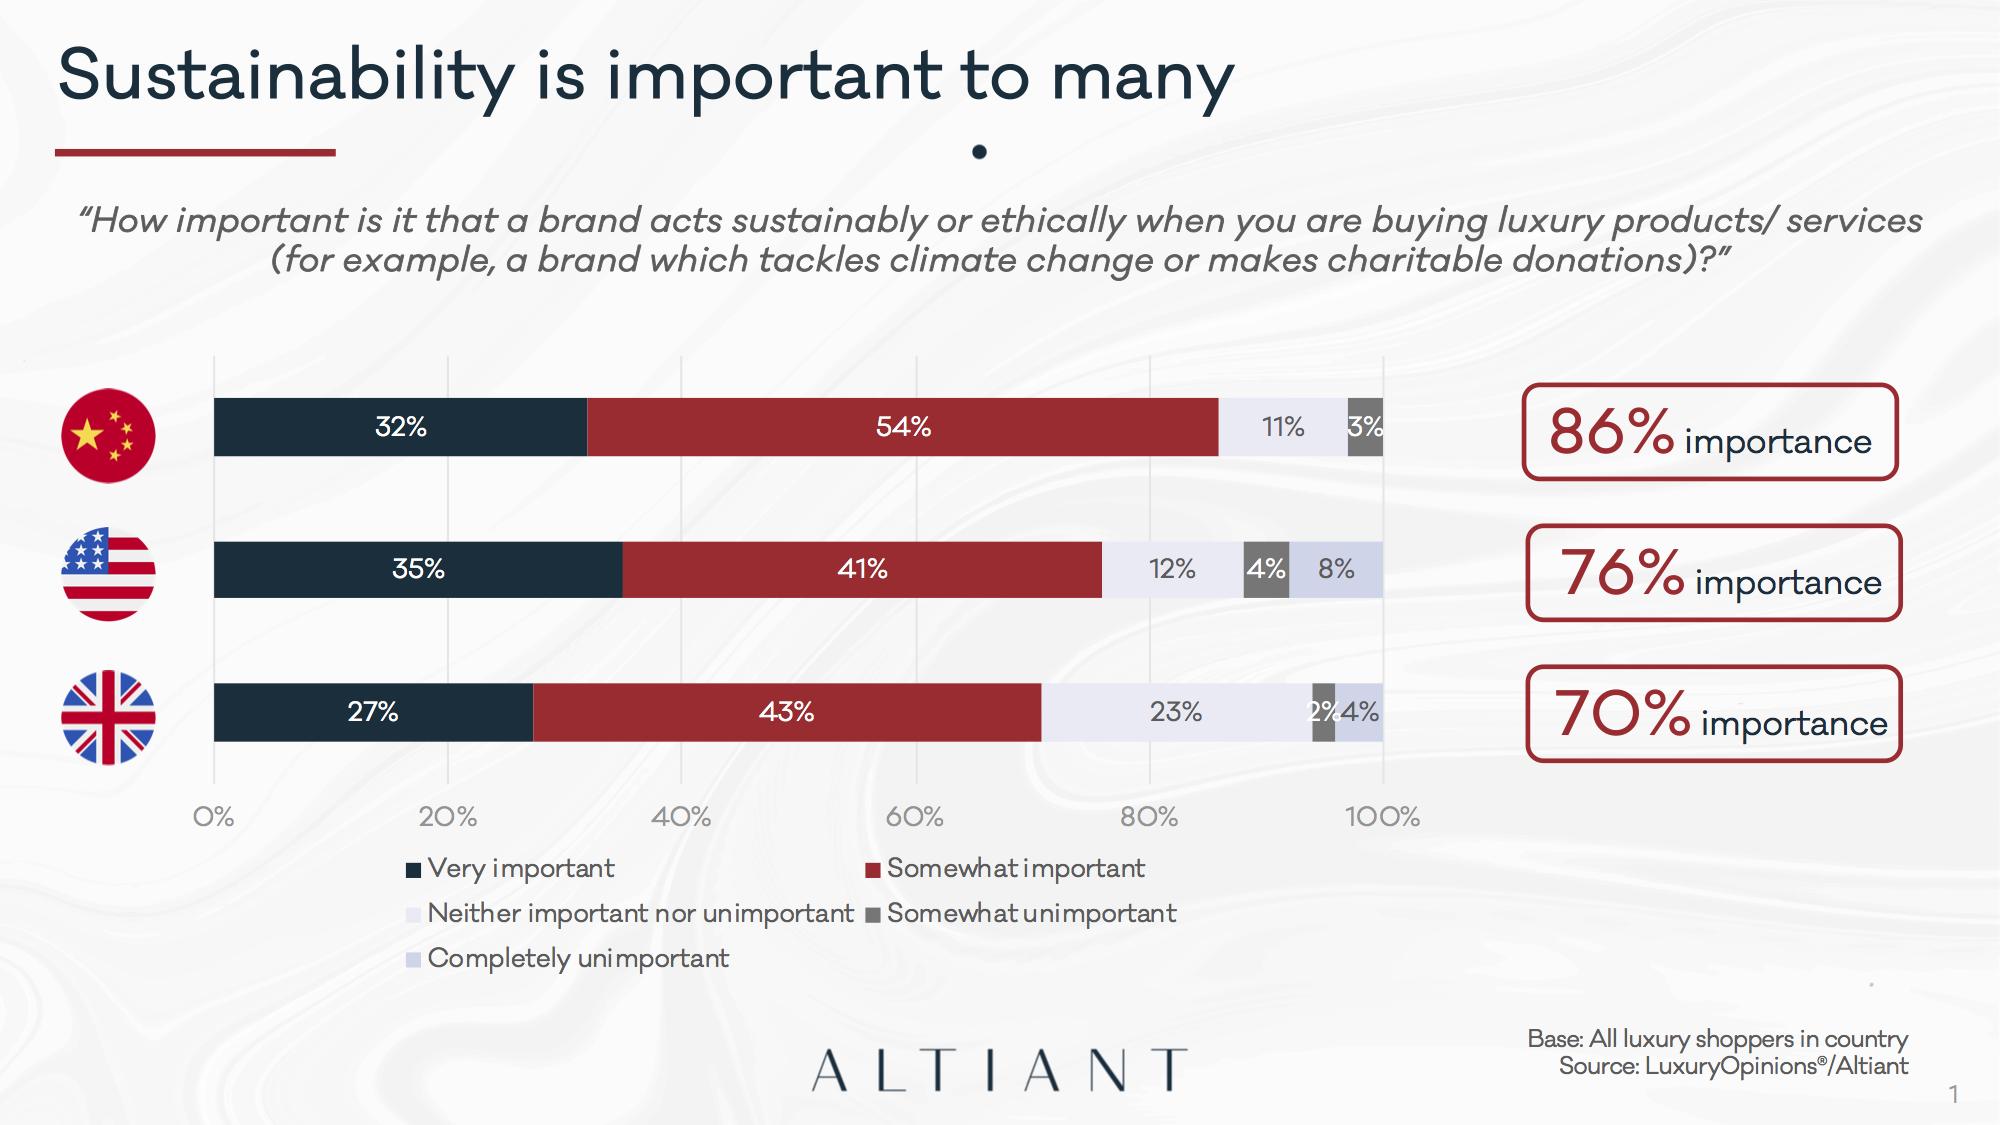 Altiant Key Luxury Trends p16 copy.png